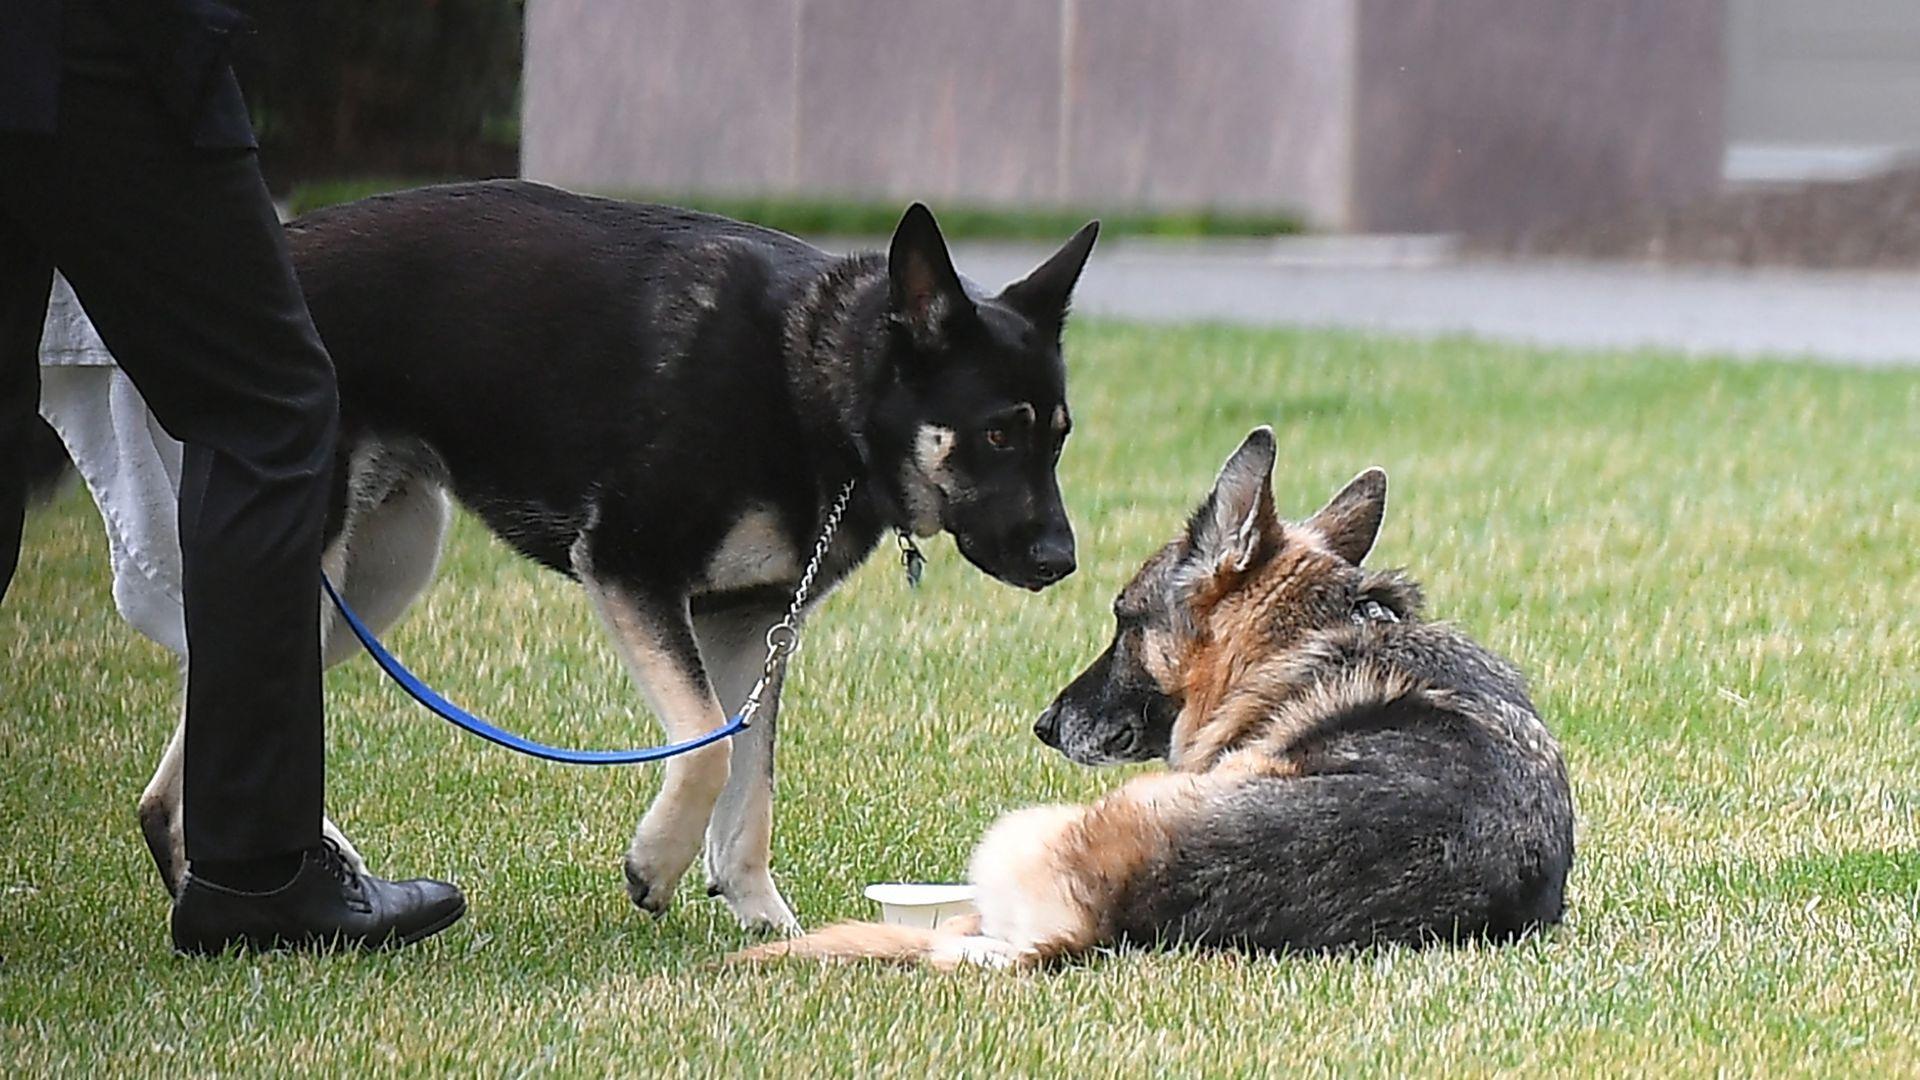 Biden family dog, Champ, has passed away - Axios